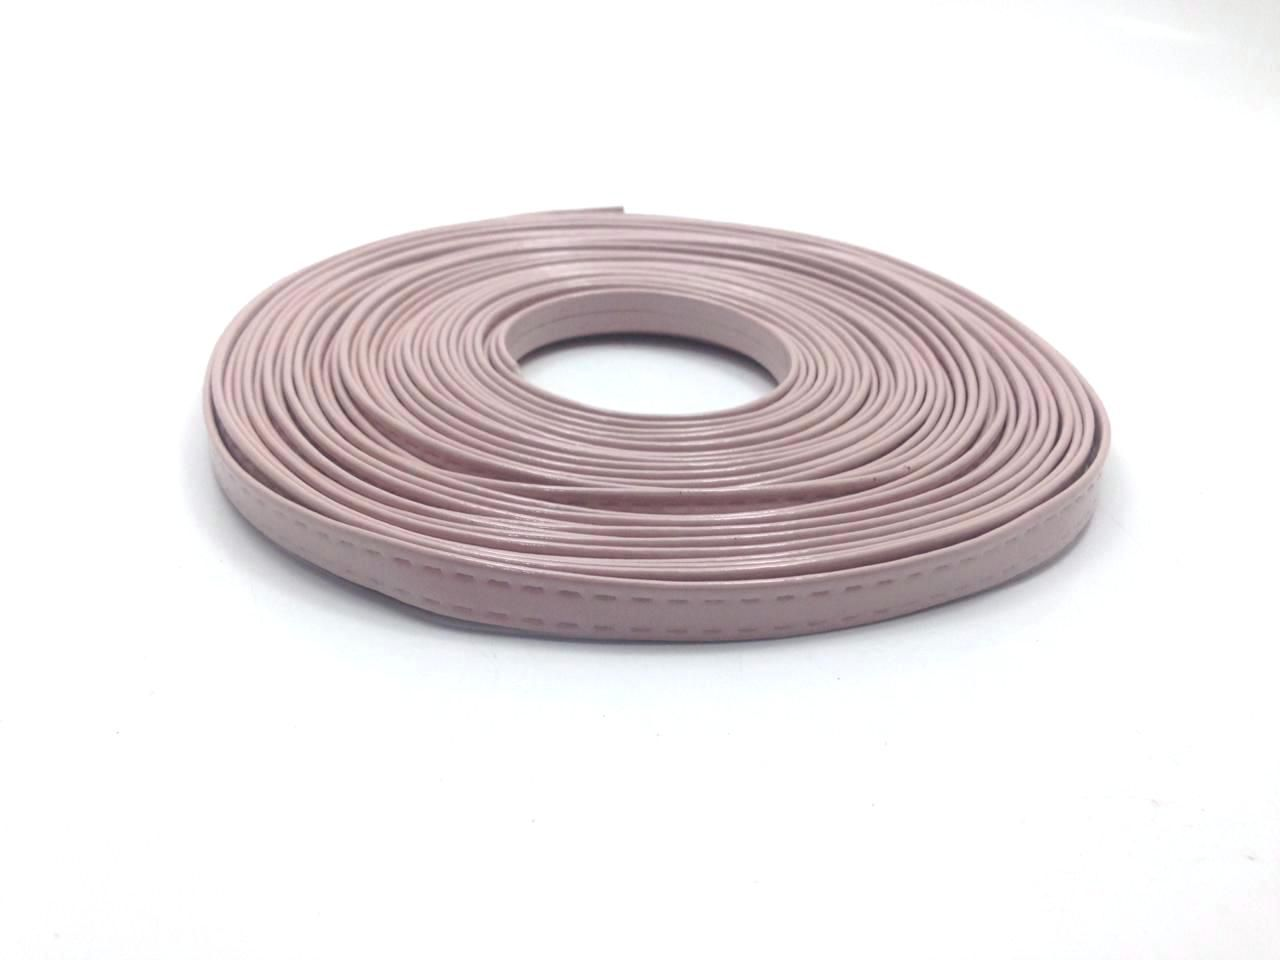 Tiras 9 mm Nude - Rolo 10 metros